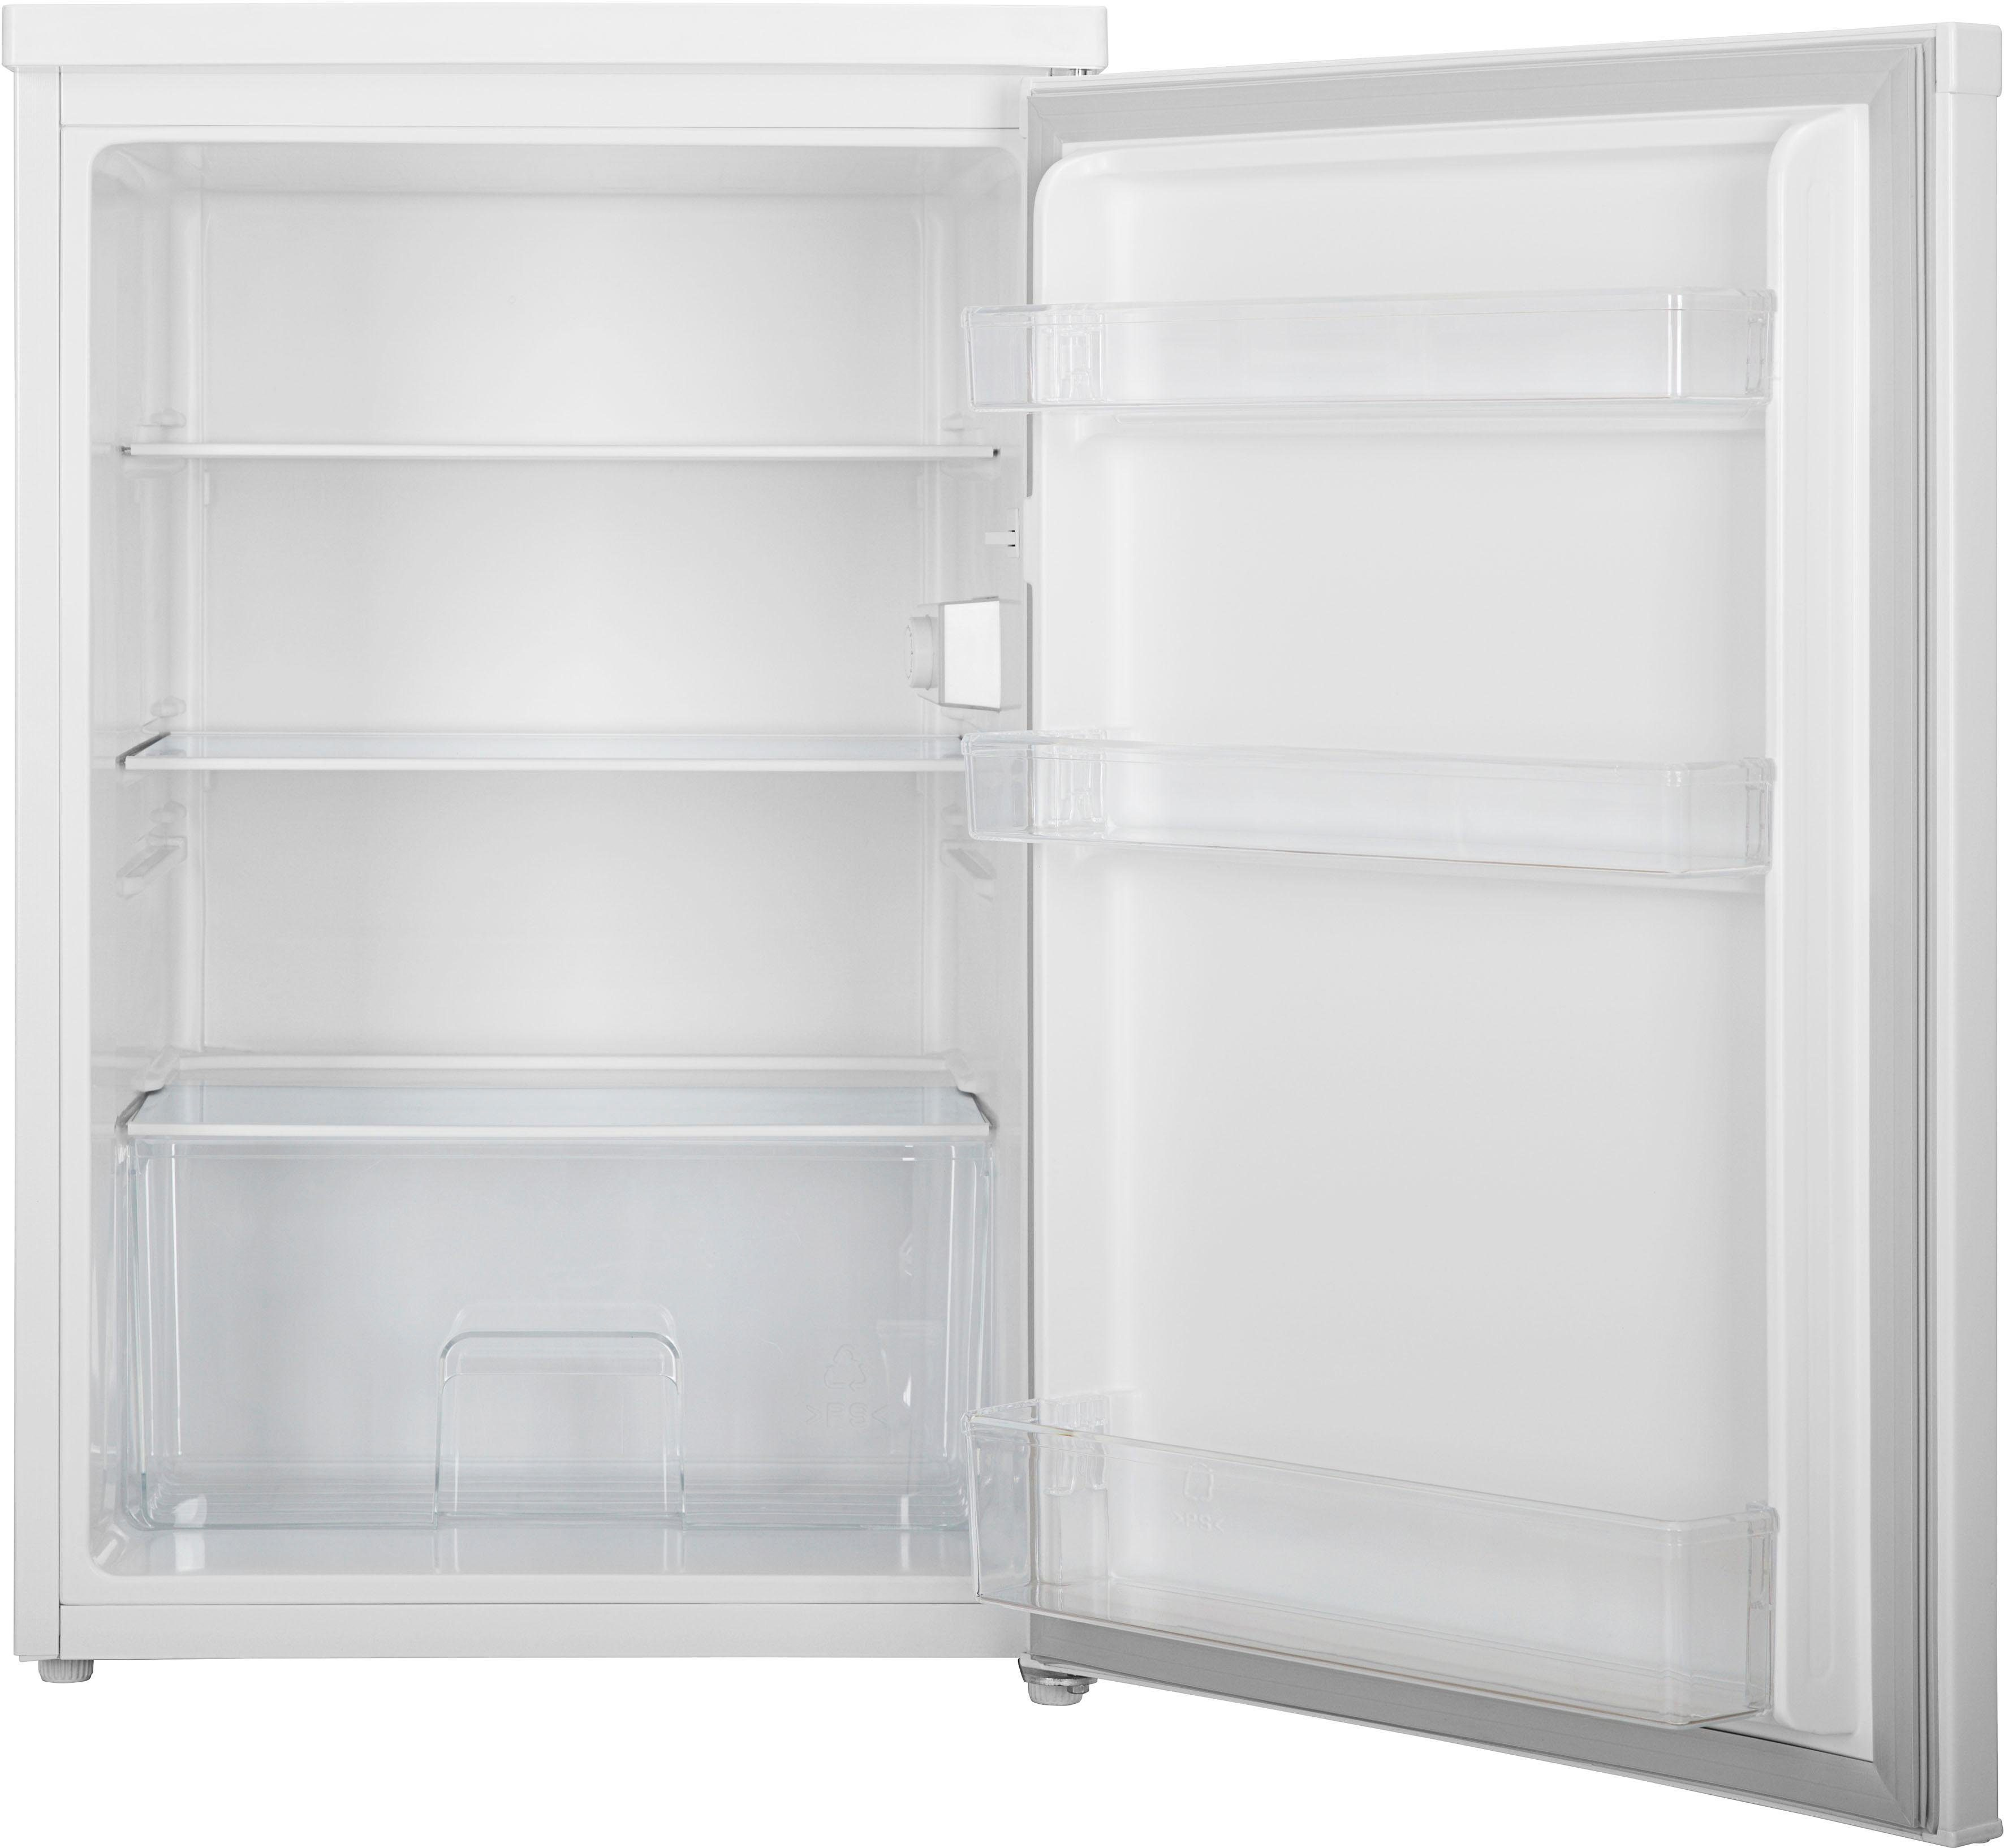 PKM Kühlschrank KS135.0A++T3, 84,5 cm hoch, 56 cm breit